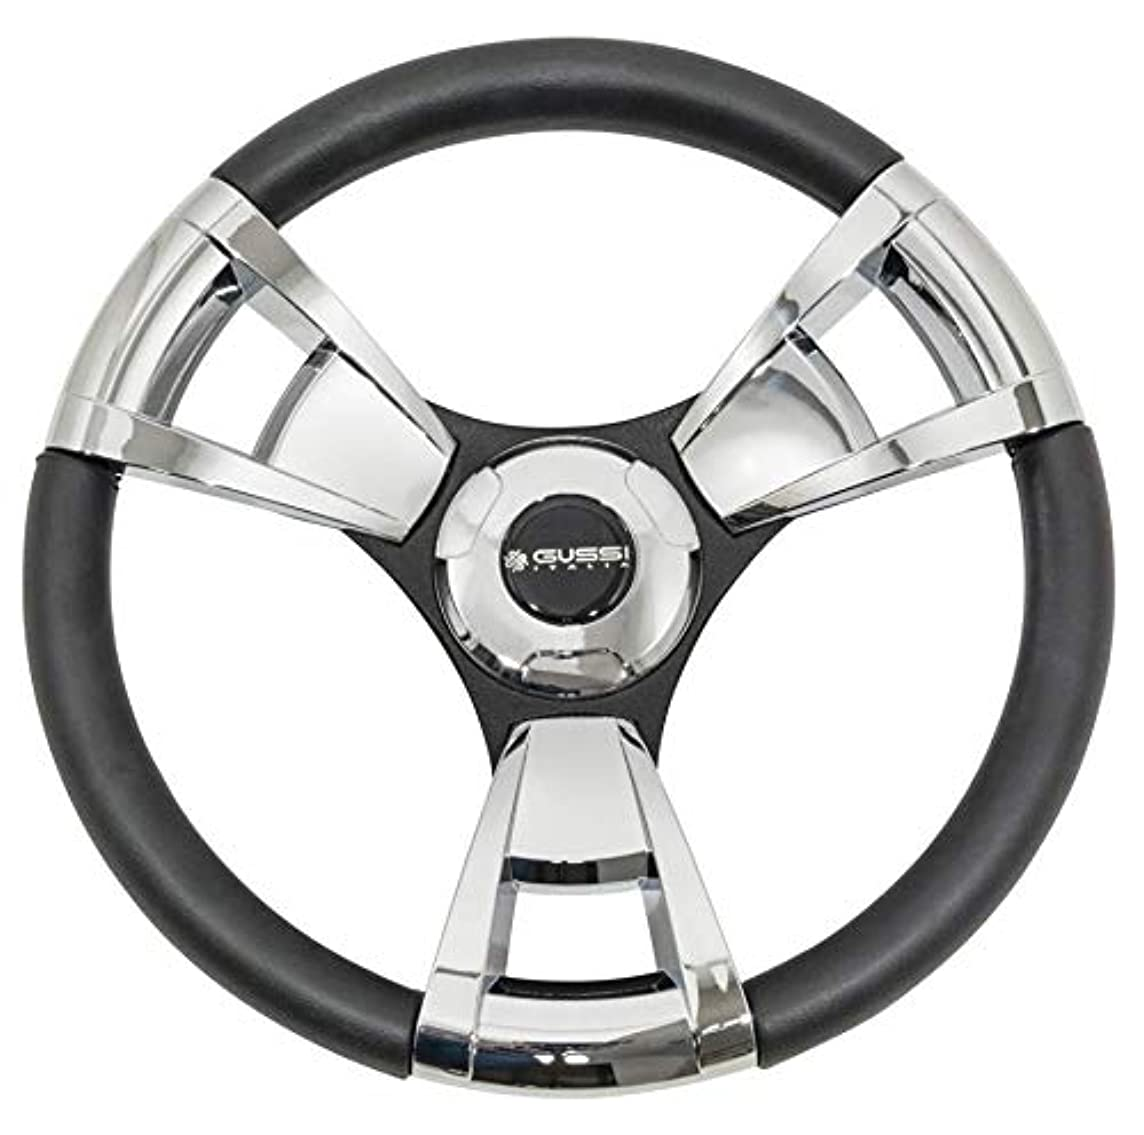 Gussi Italia Model 13 Chrome/Black Premium Italian-Made Steering Wheel for Golf Carts - Club Car, EZGO, Yamaha, Tomberlin - No Hub Adapter Needed